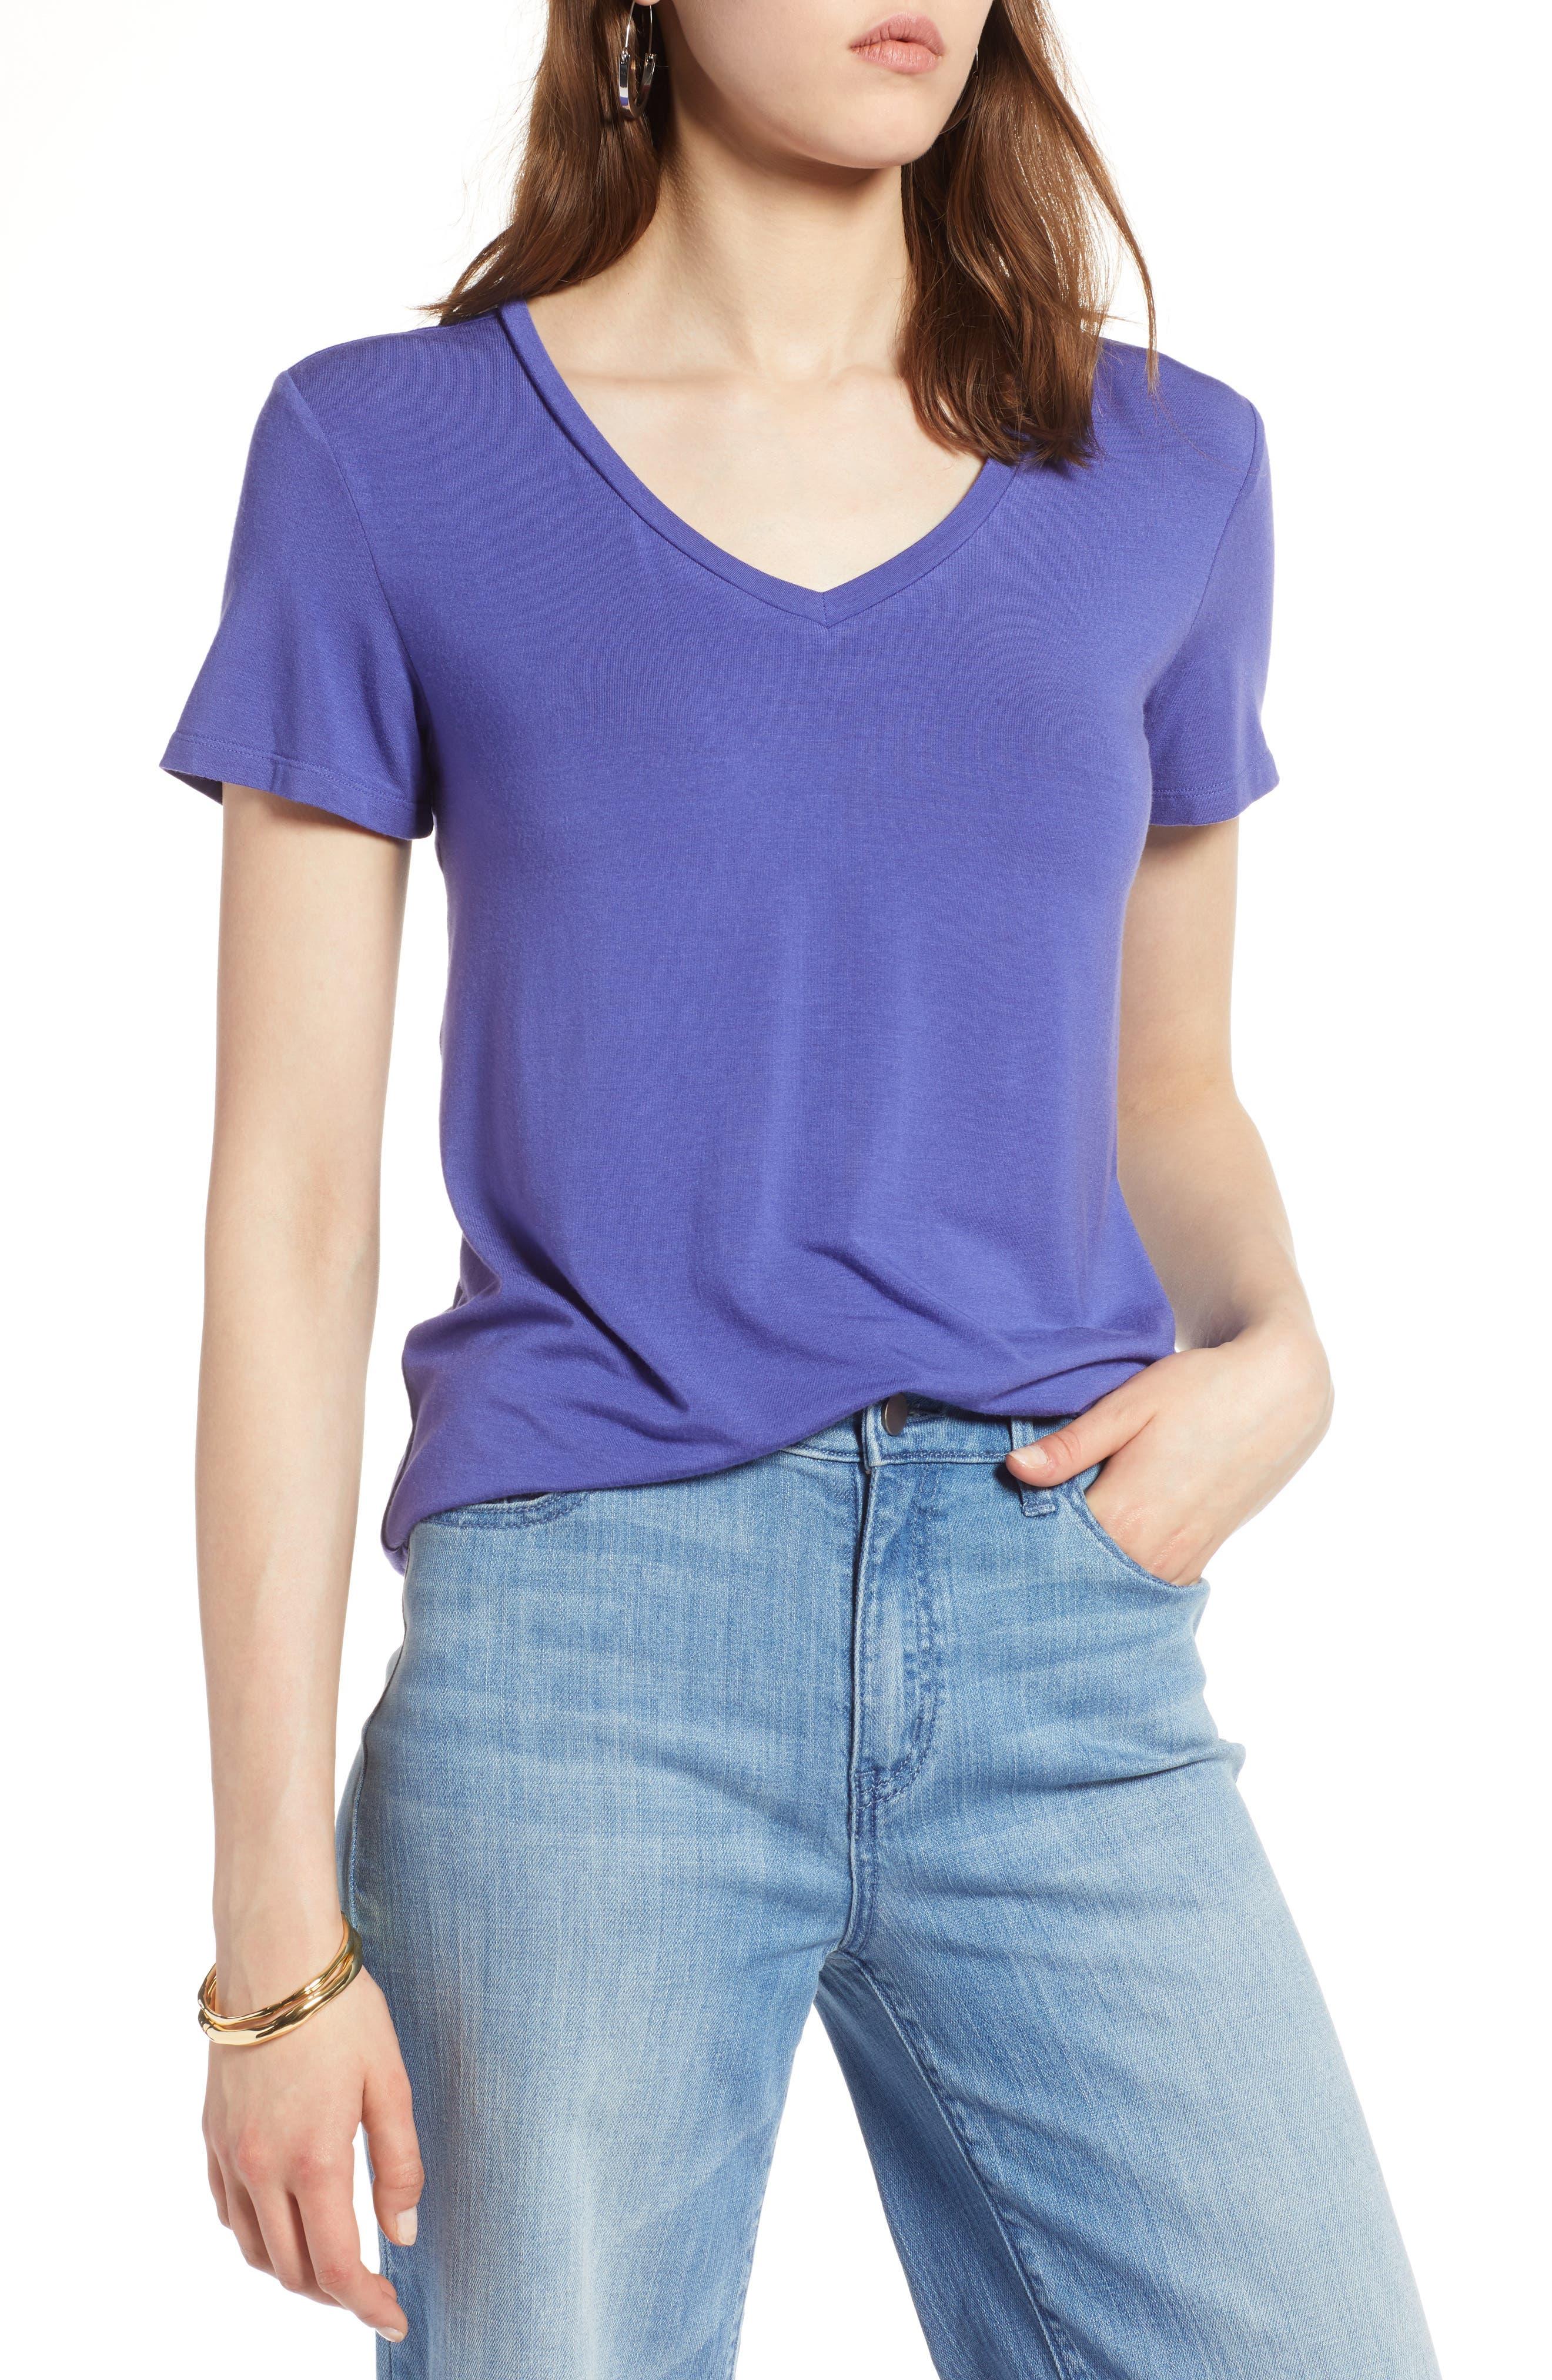 Betty Co Women's 3/4 Sleeve T-Shirt Blau (Lilac 8005) Cost Clearance Order Cheap Sale Top Quality Original Classic 00prW0L